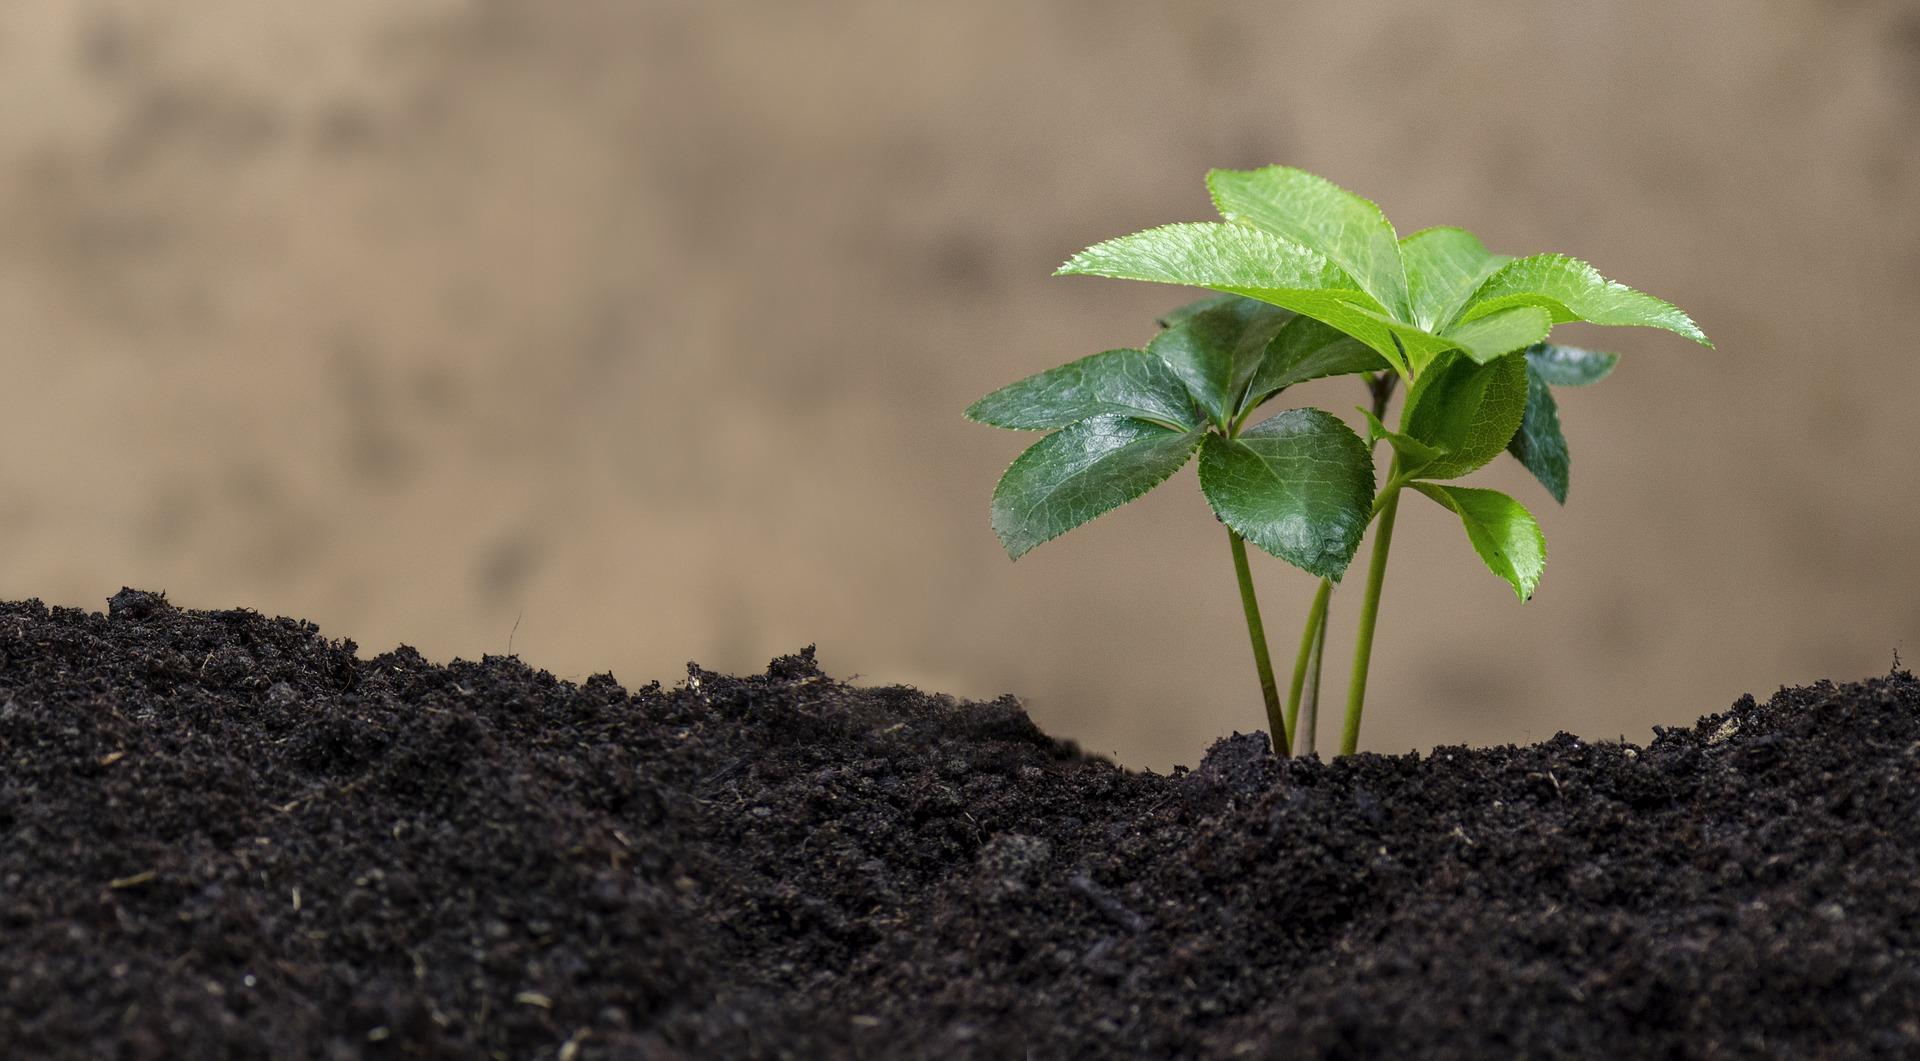 green-plant-2352478_1920